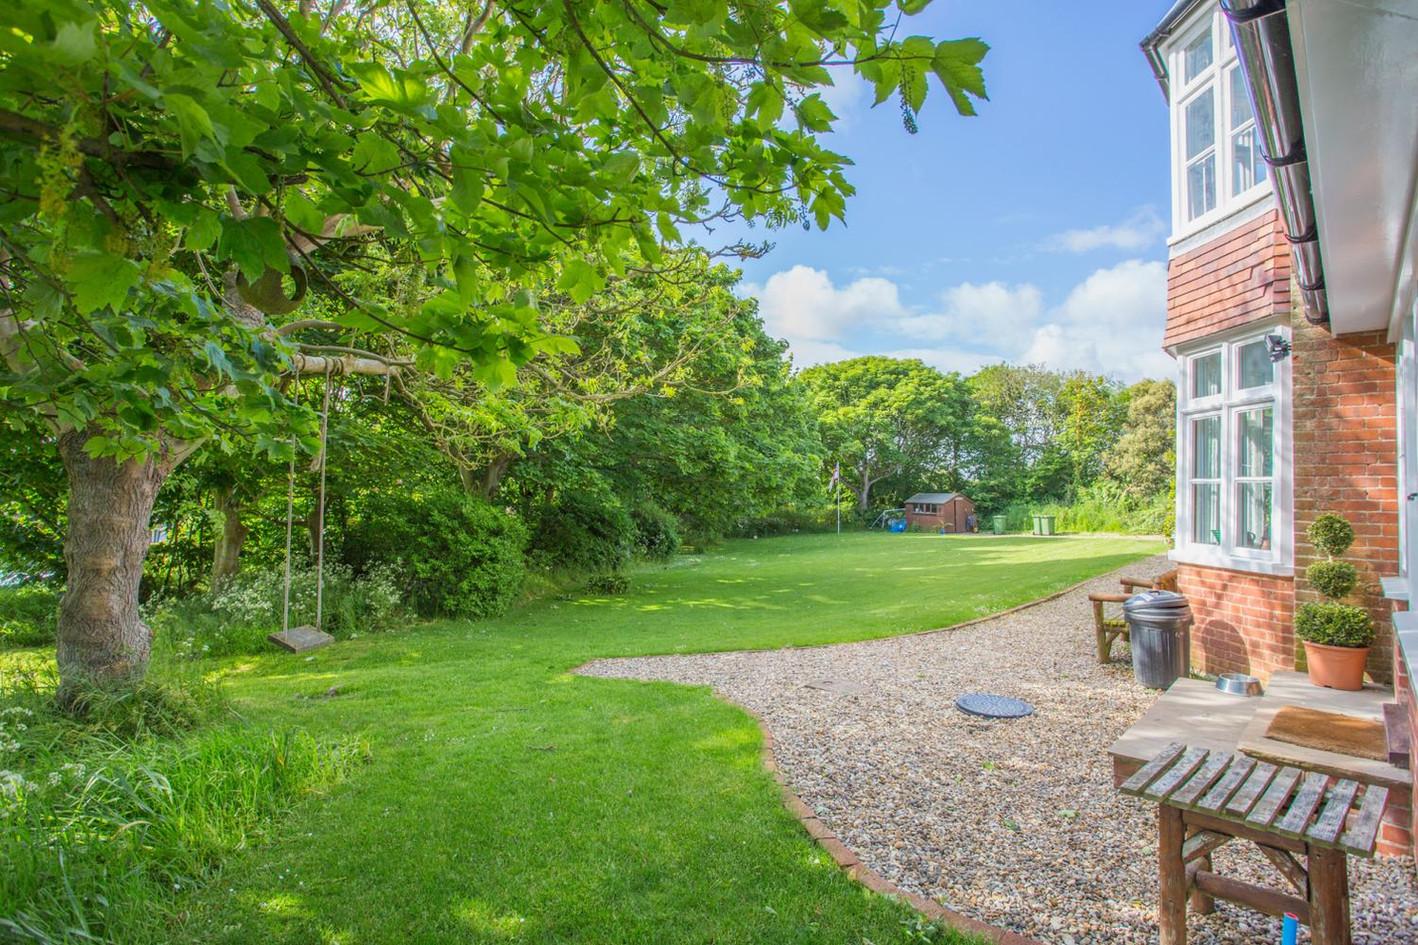 Meadow House gardens